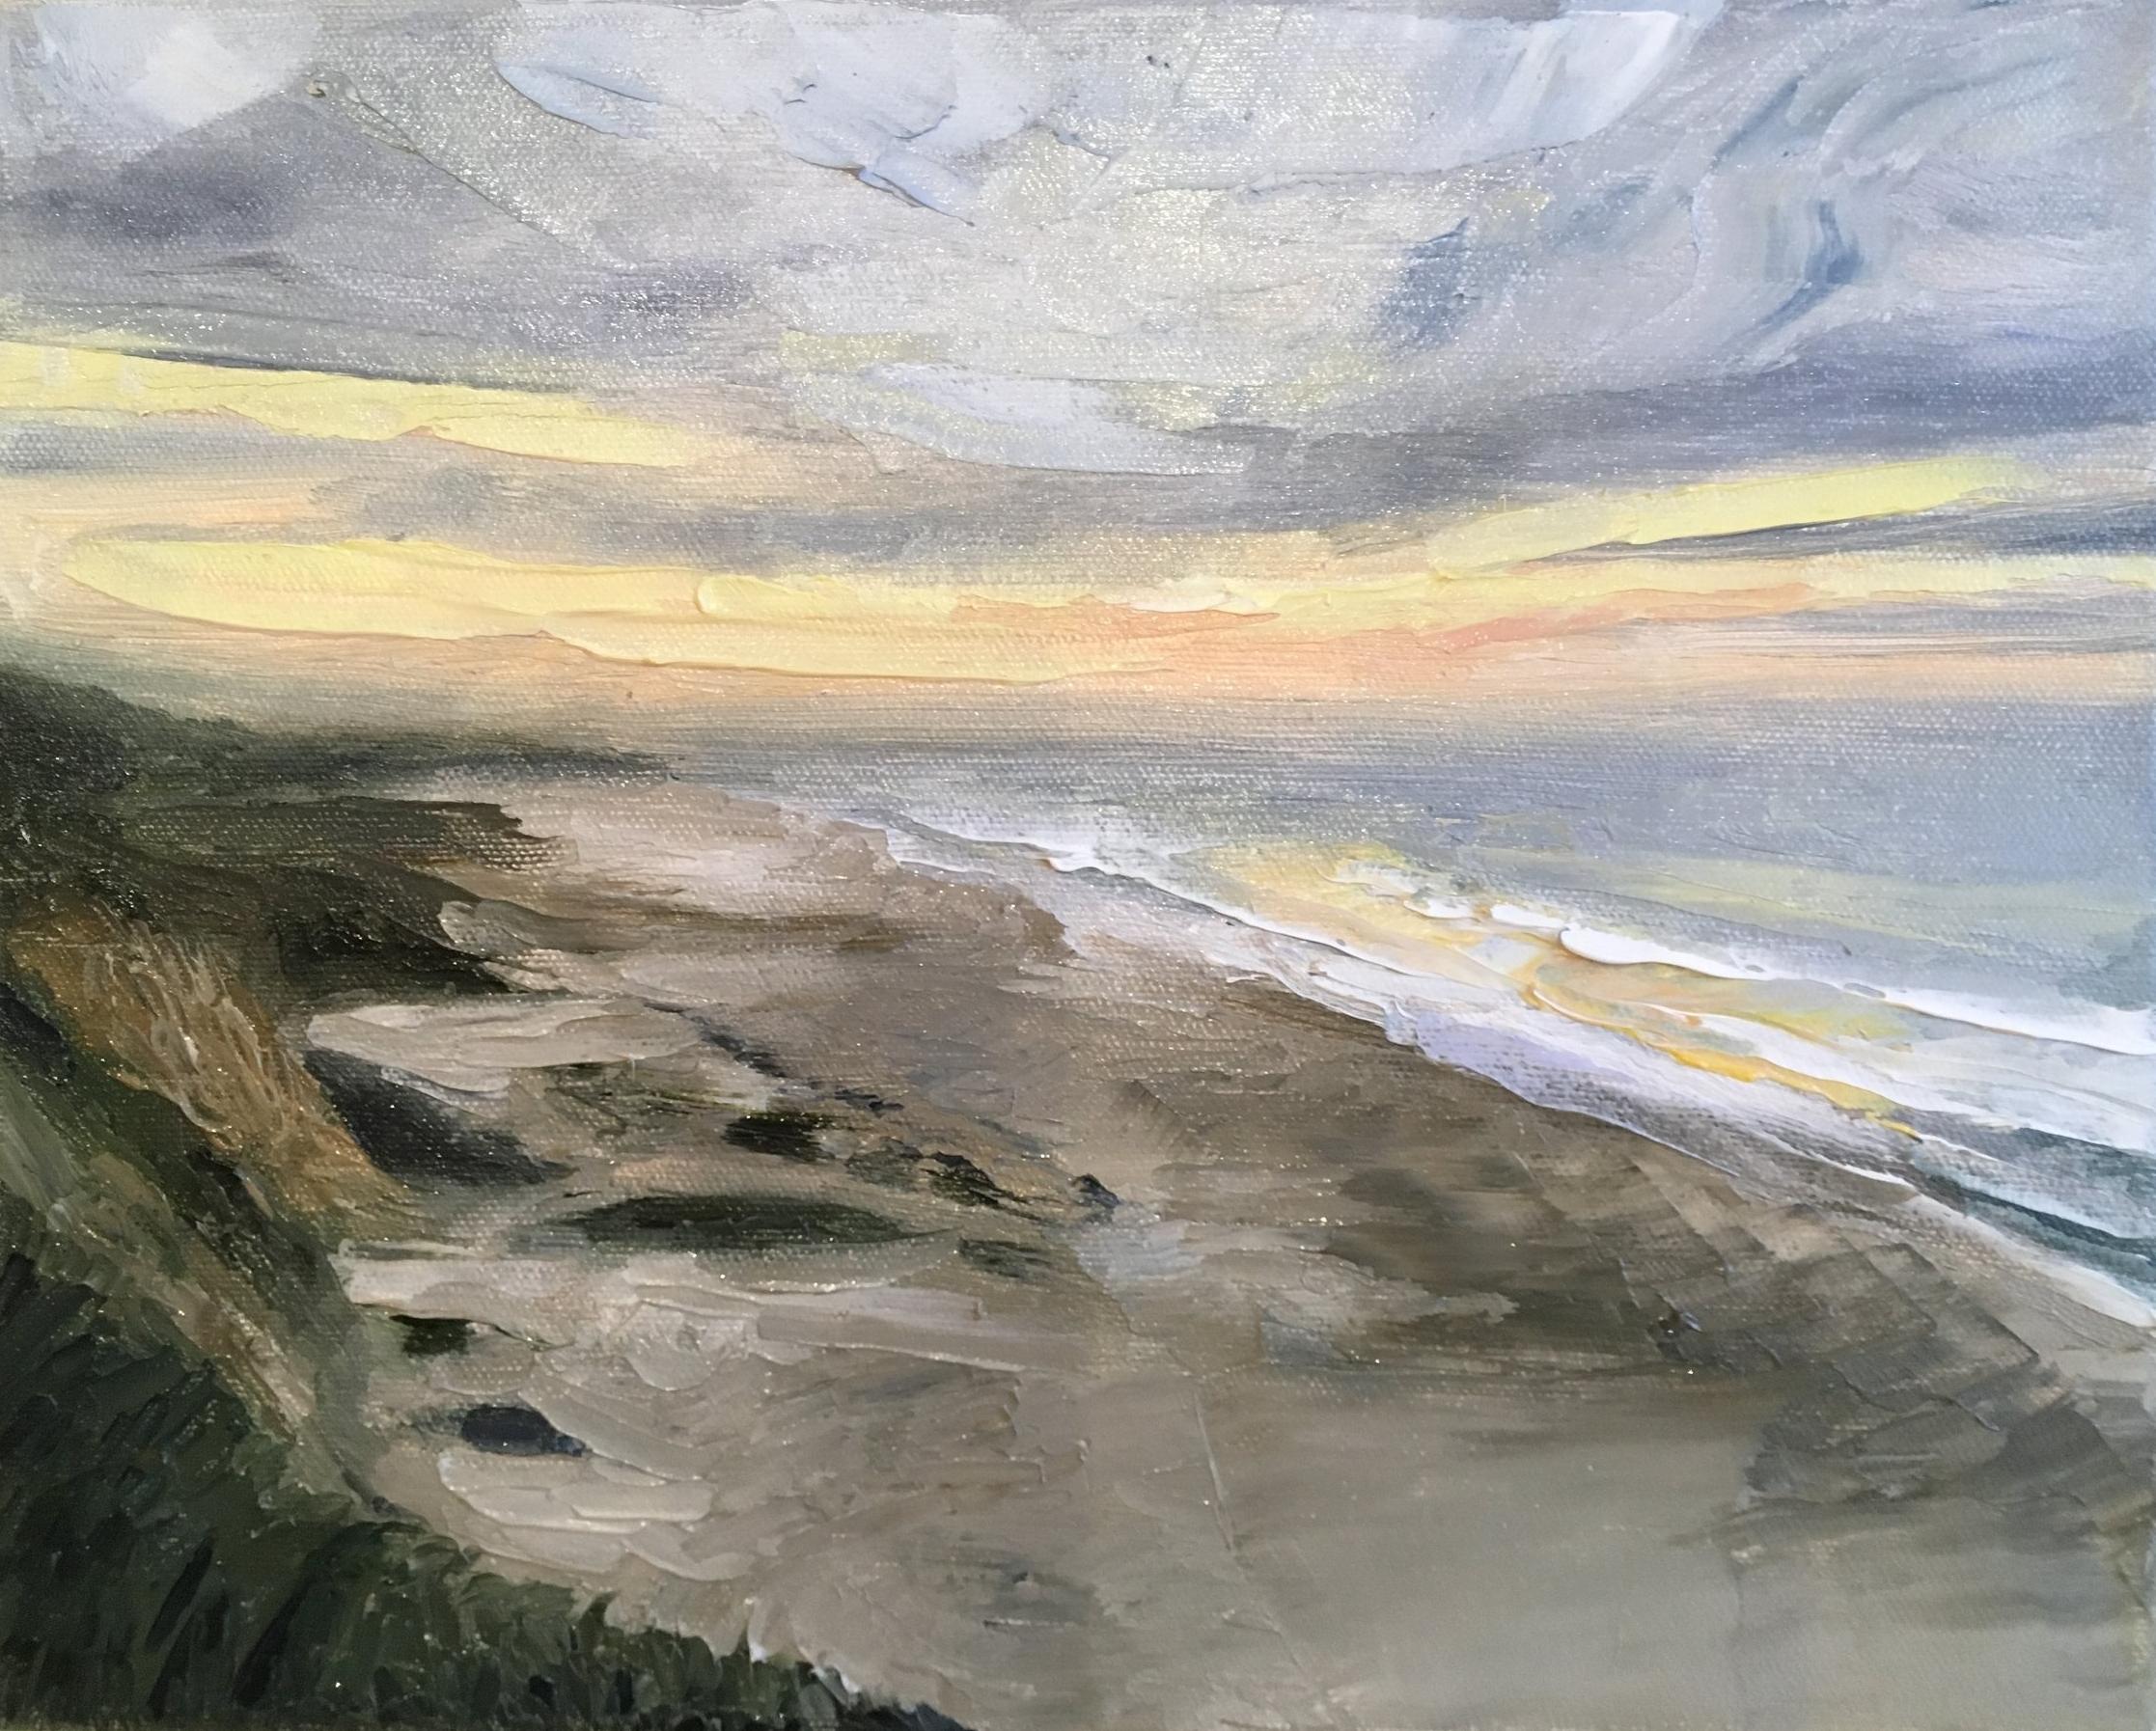 "Half moon bay, 12 x 9"" oil on canvas"